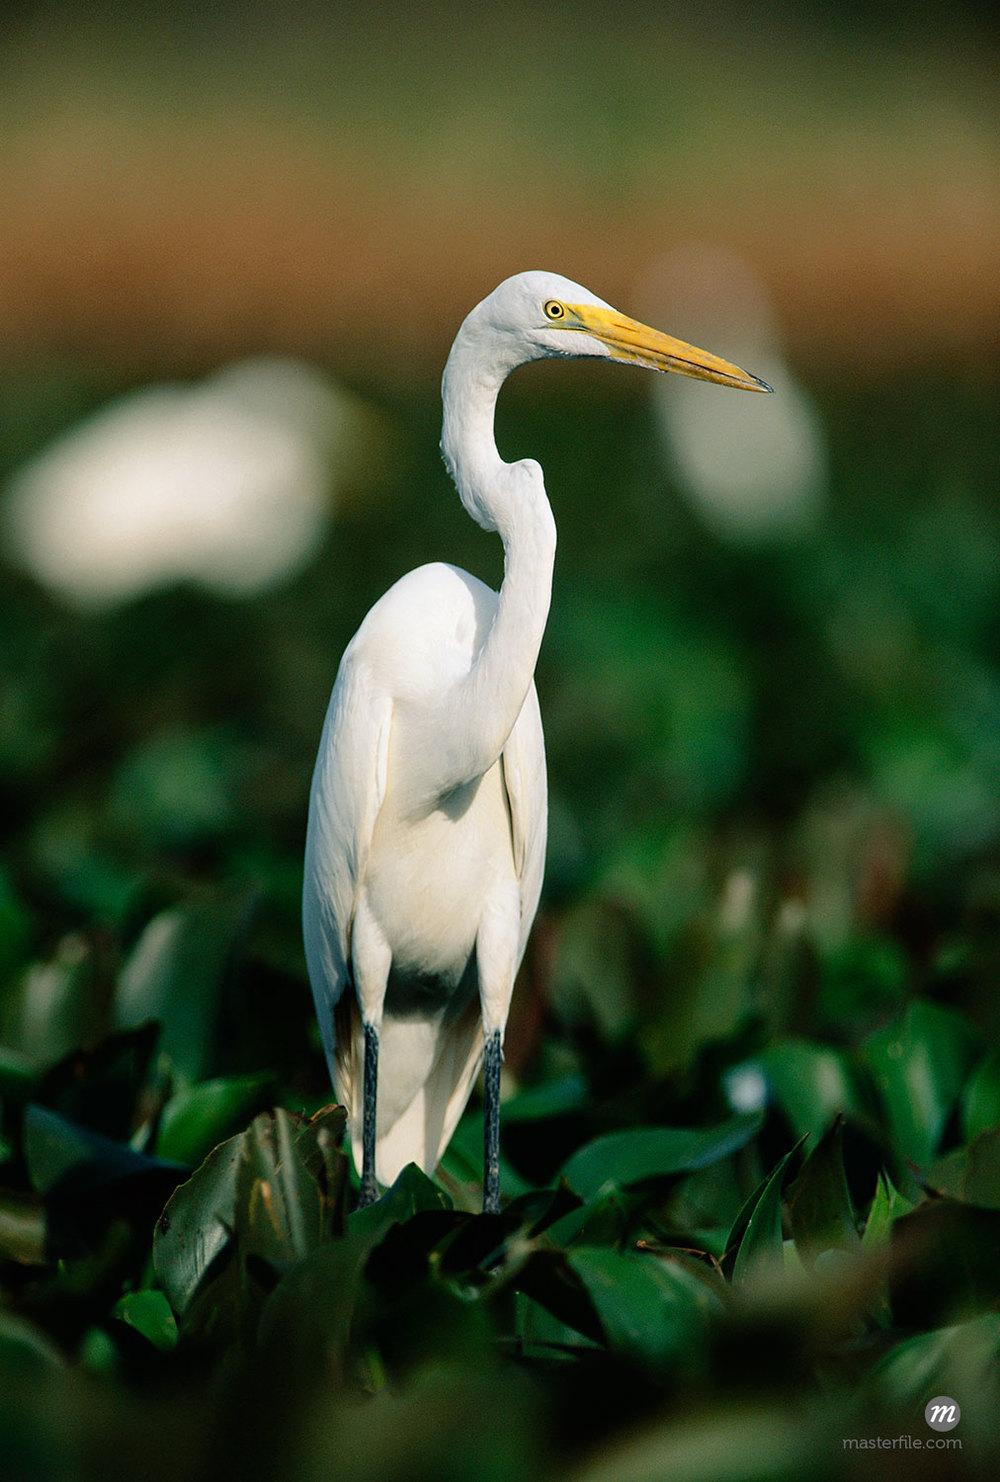 Great Egret, Llanos Orinoco, Venezuela  © Frank Krahmer / Masterfile